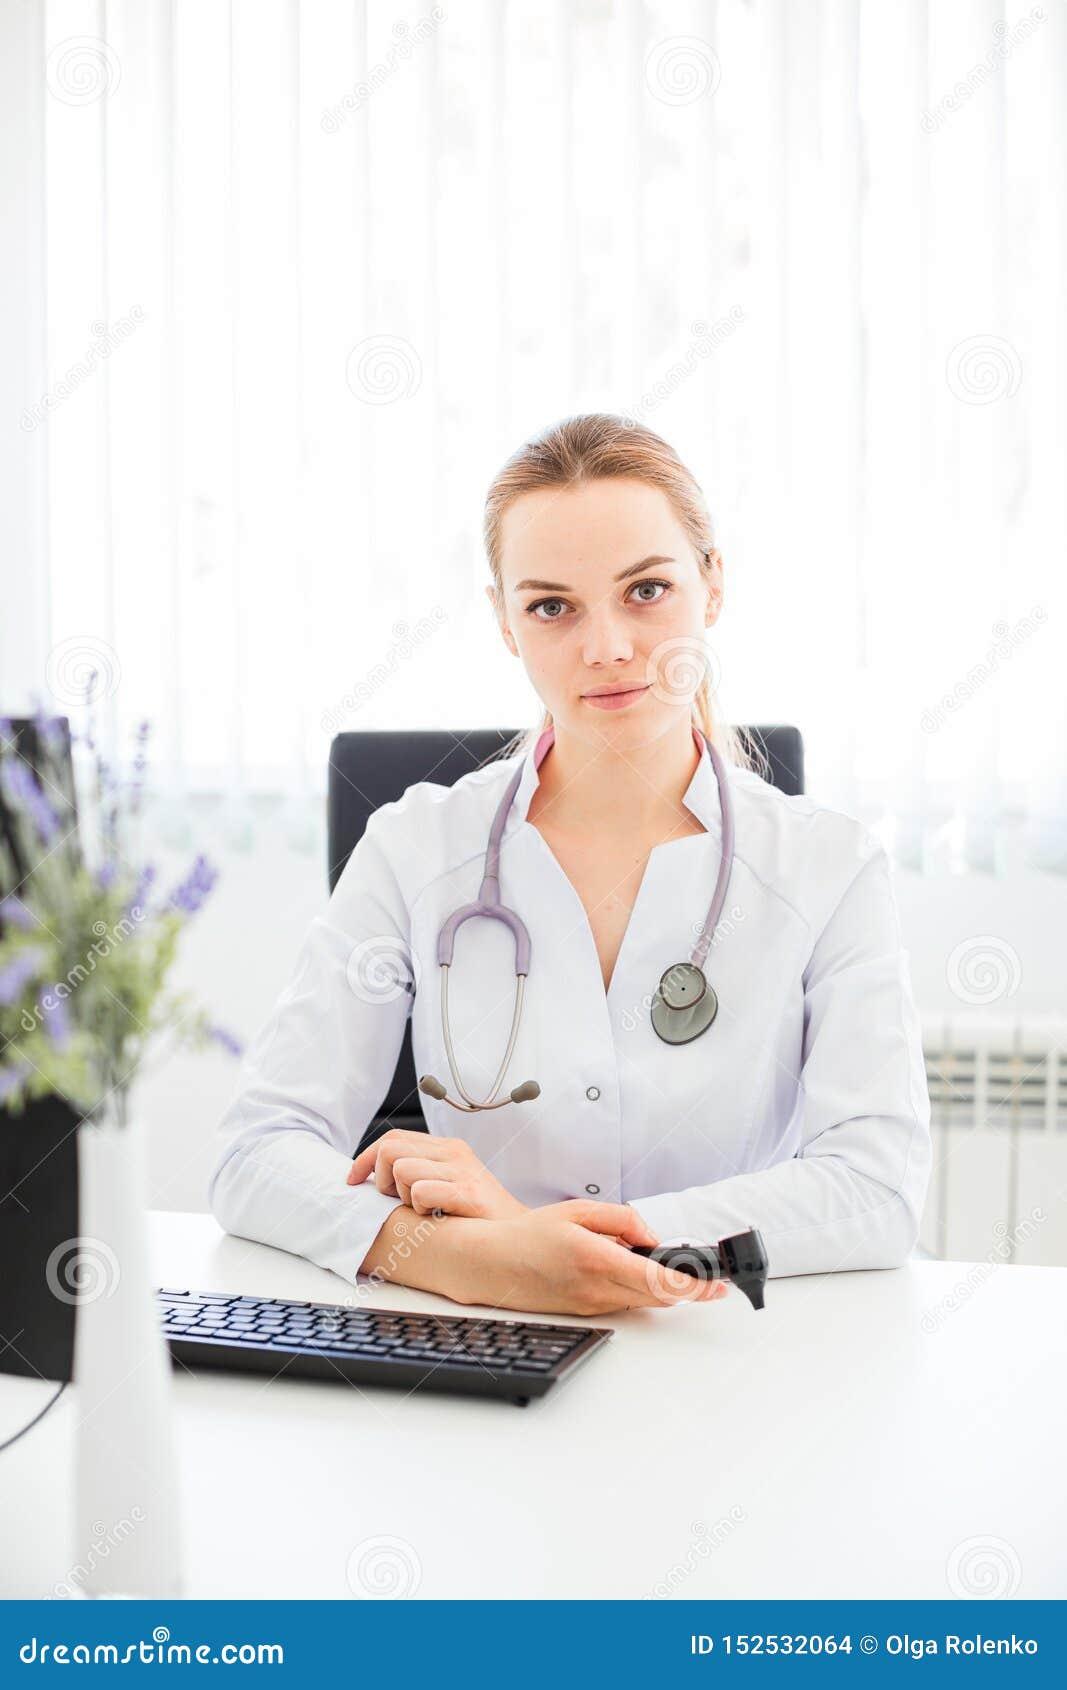 Den unga le doktorn som sitter på skrivbordet på en svart stol med hennes armar, korsade